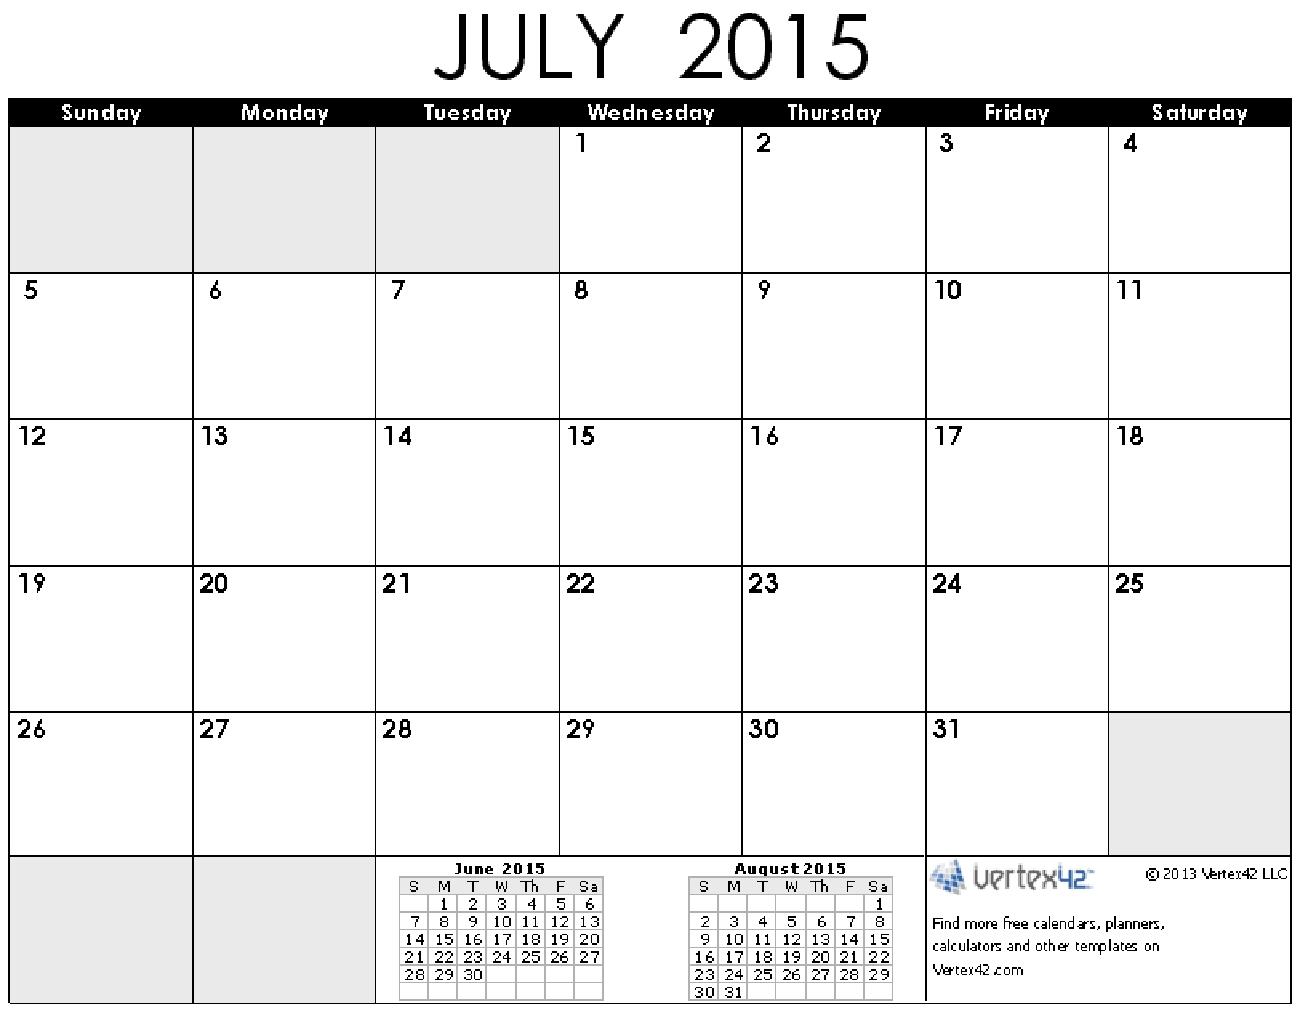 Showy Blank Calendar Nov Printable Editable Blank Calendar Printable in Full Size Blank Printable Calendar